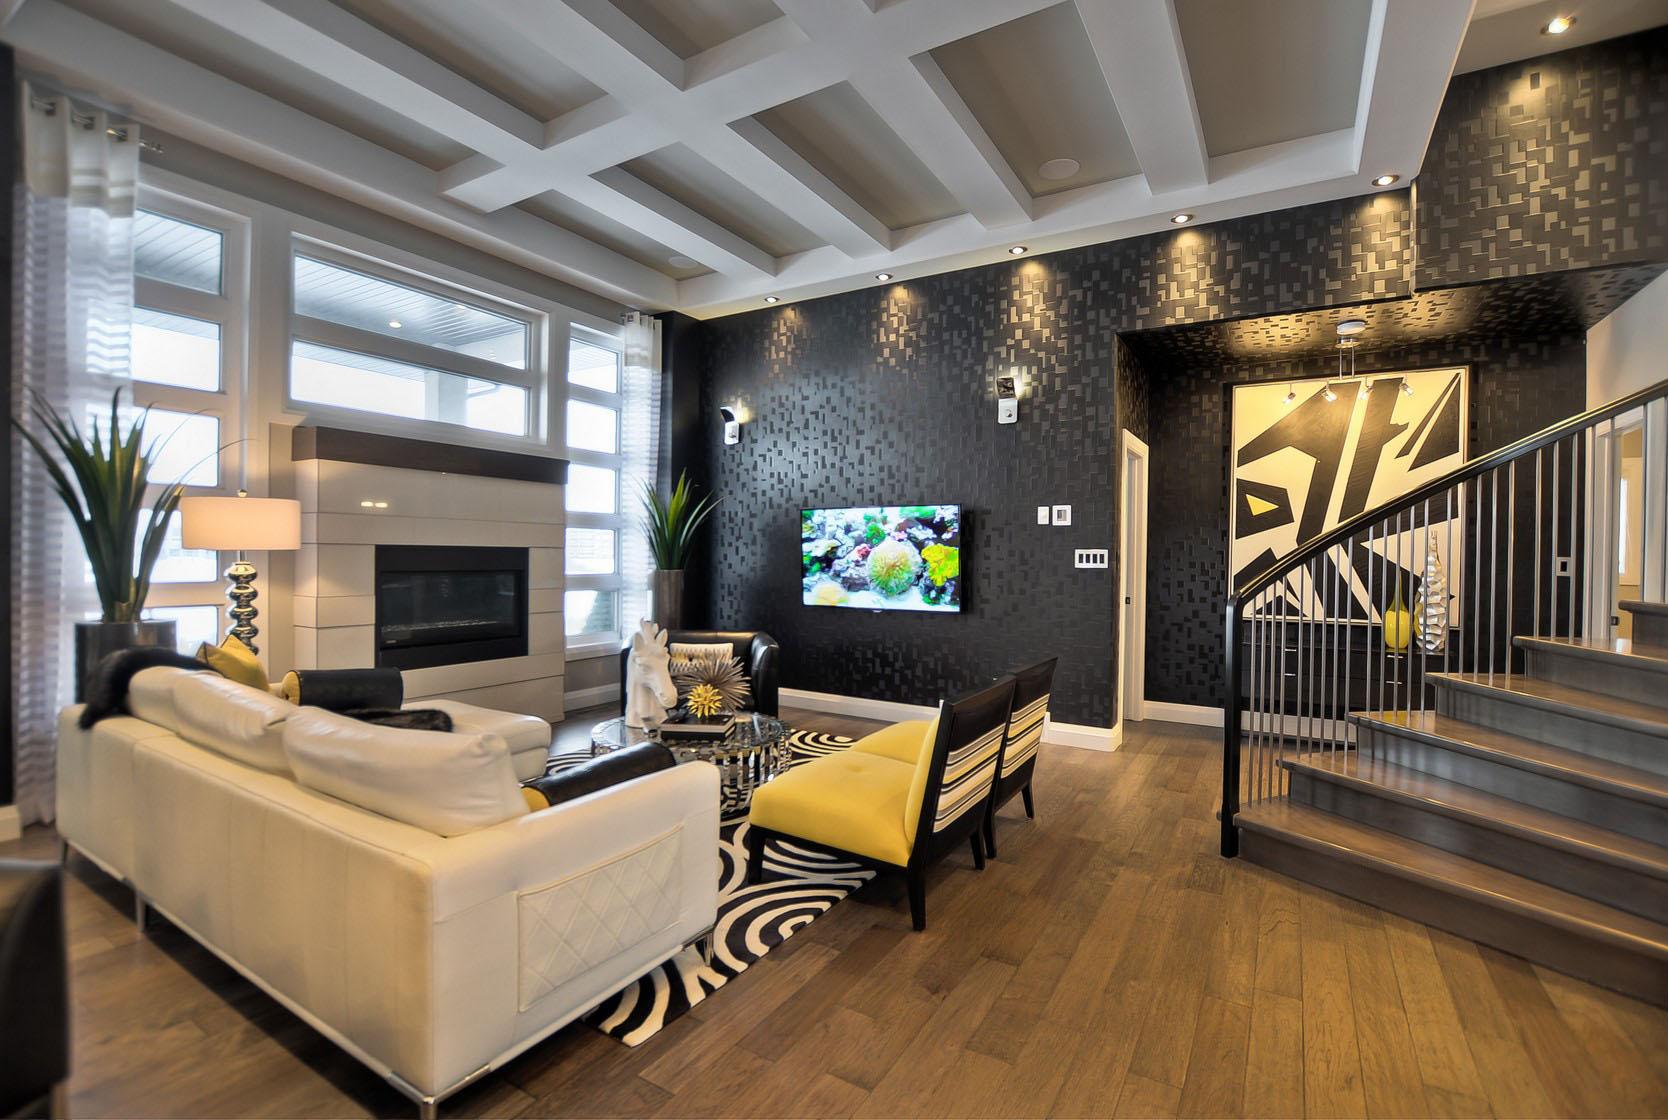 Interior decoration of living room